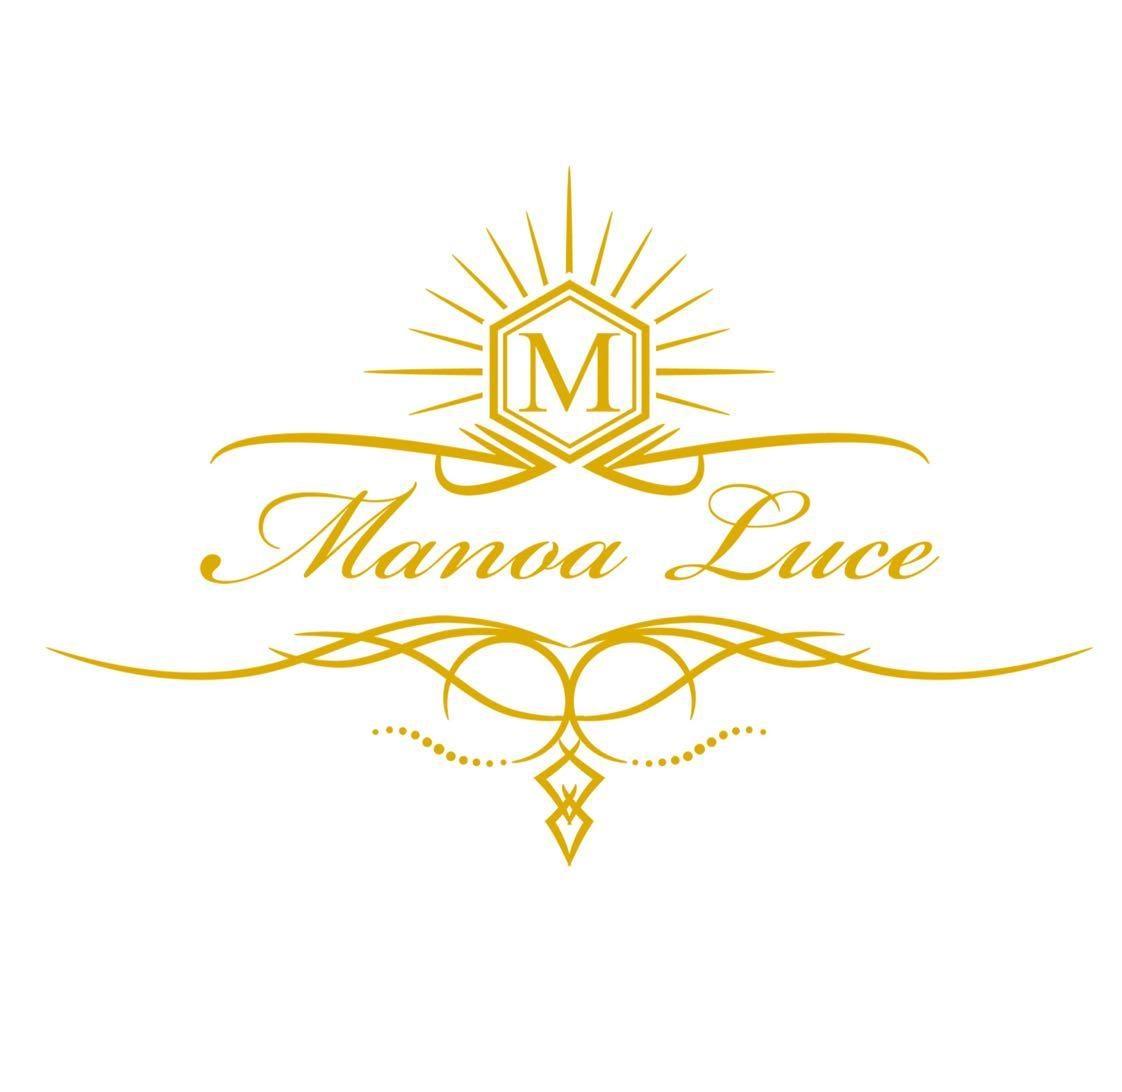 Manoa Luce